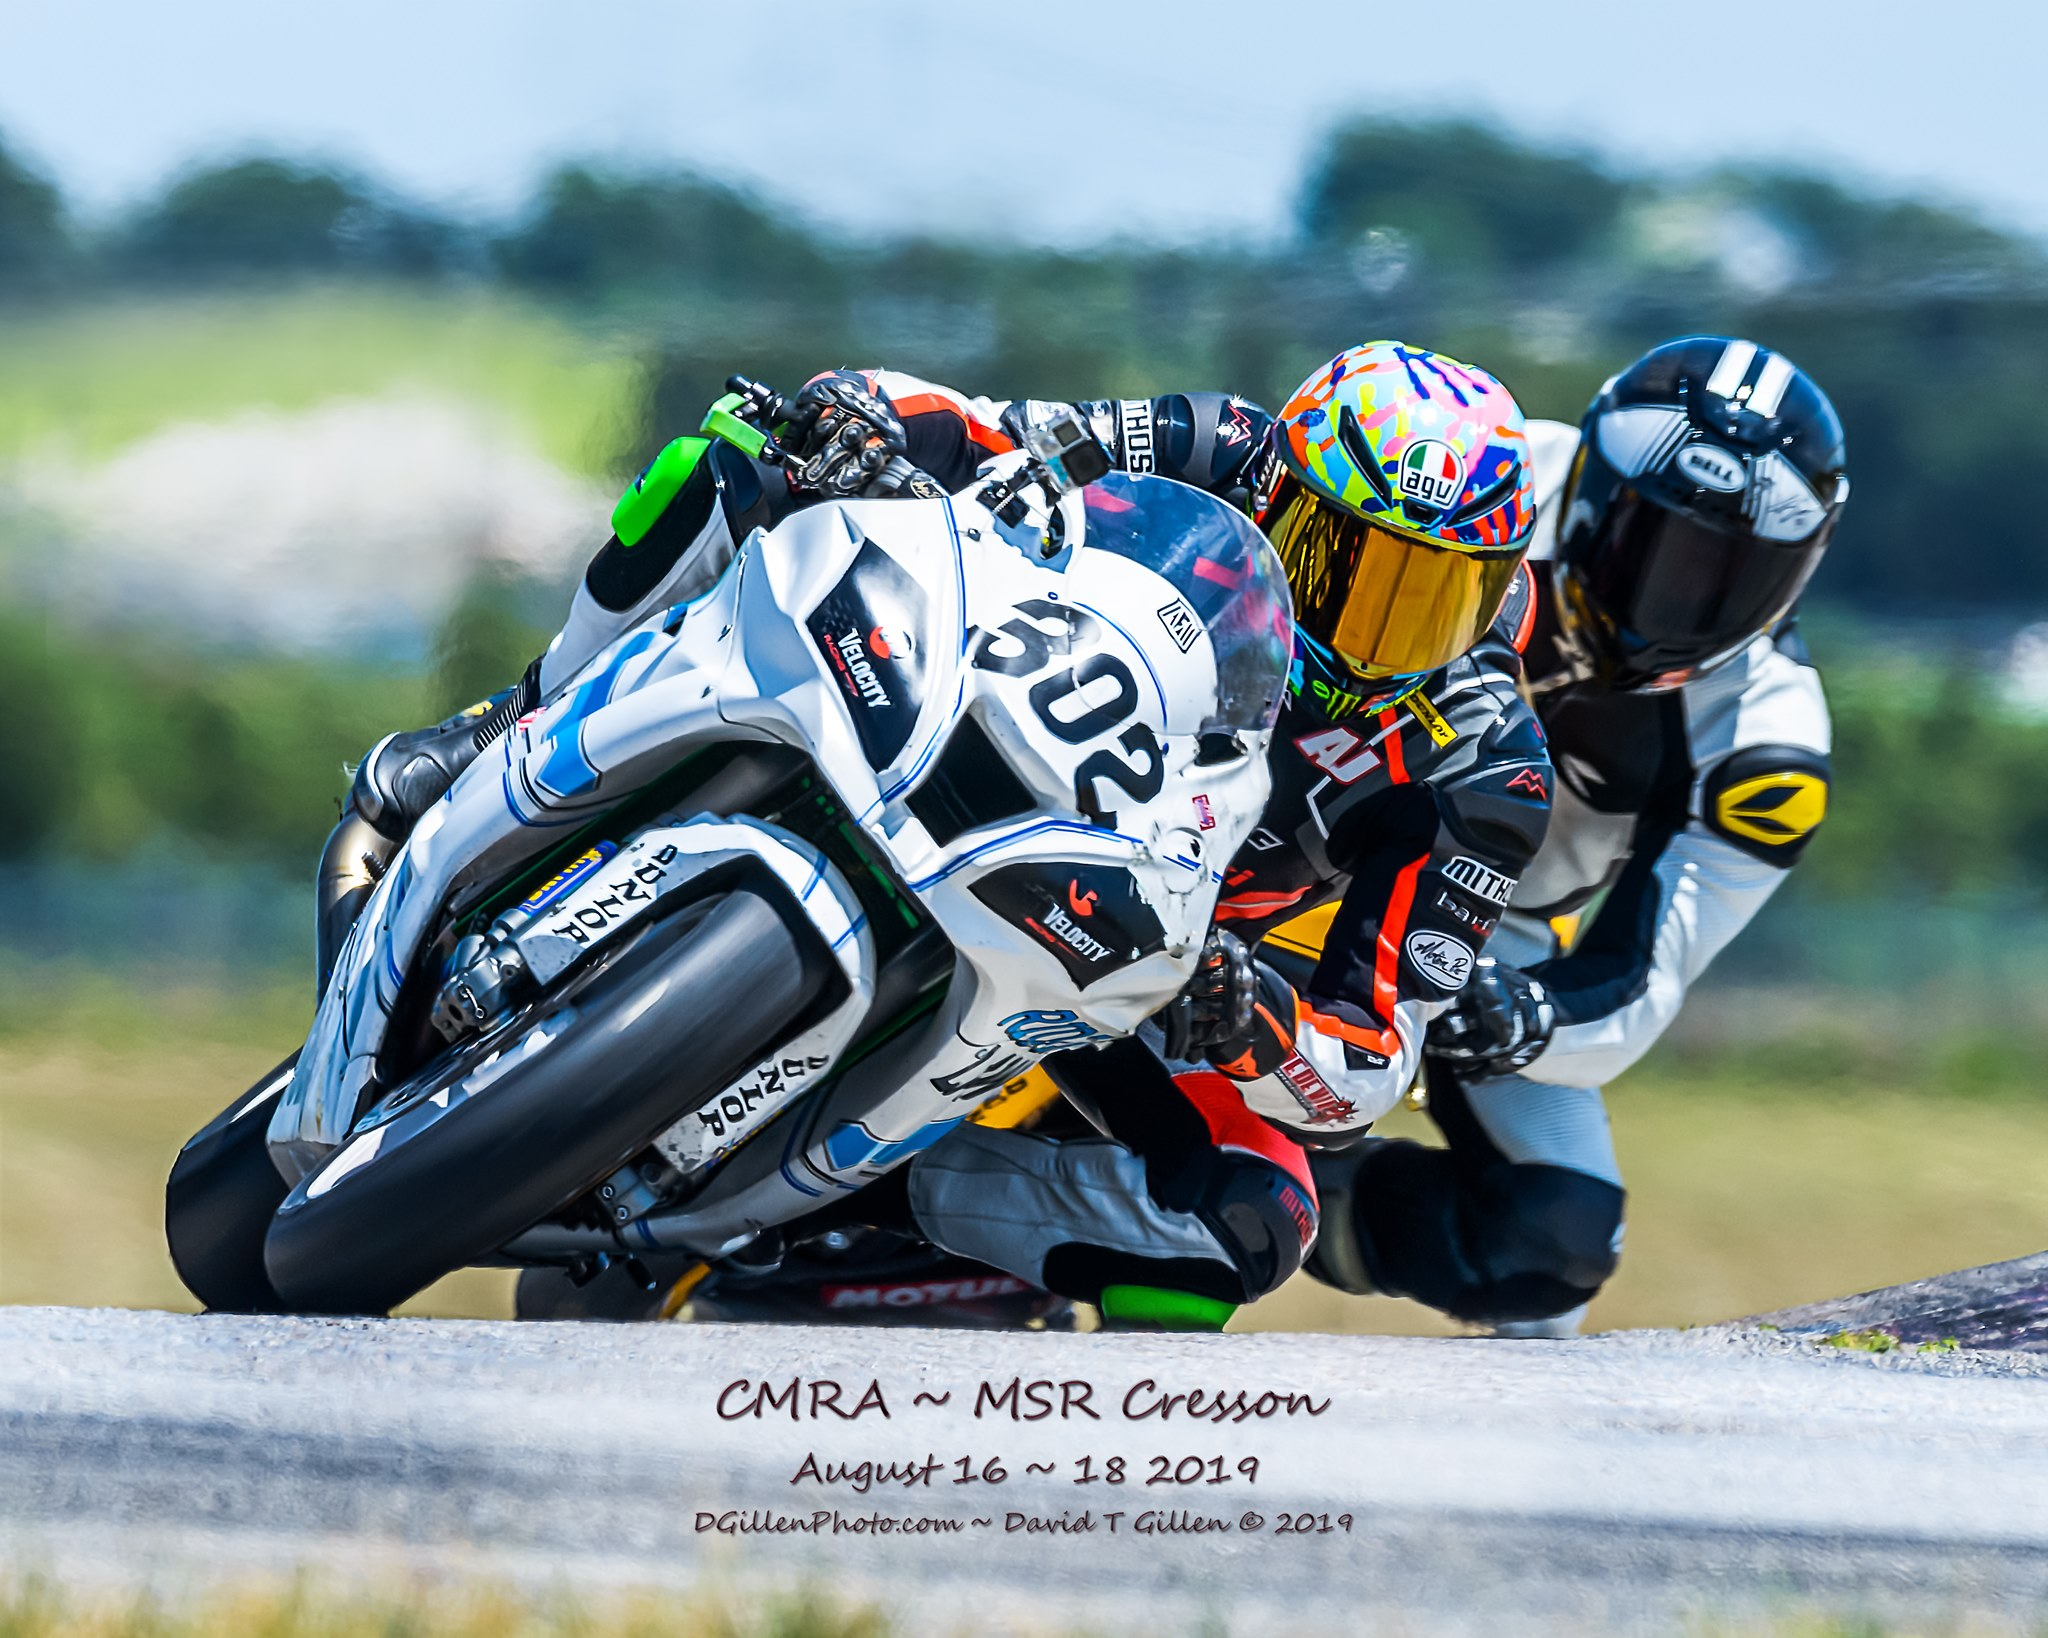 RiderzLaw Racer AJ Jacobsen racing at Chuckwalla Raceway in California